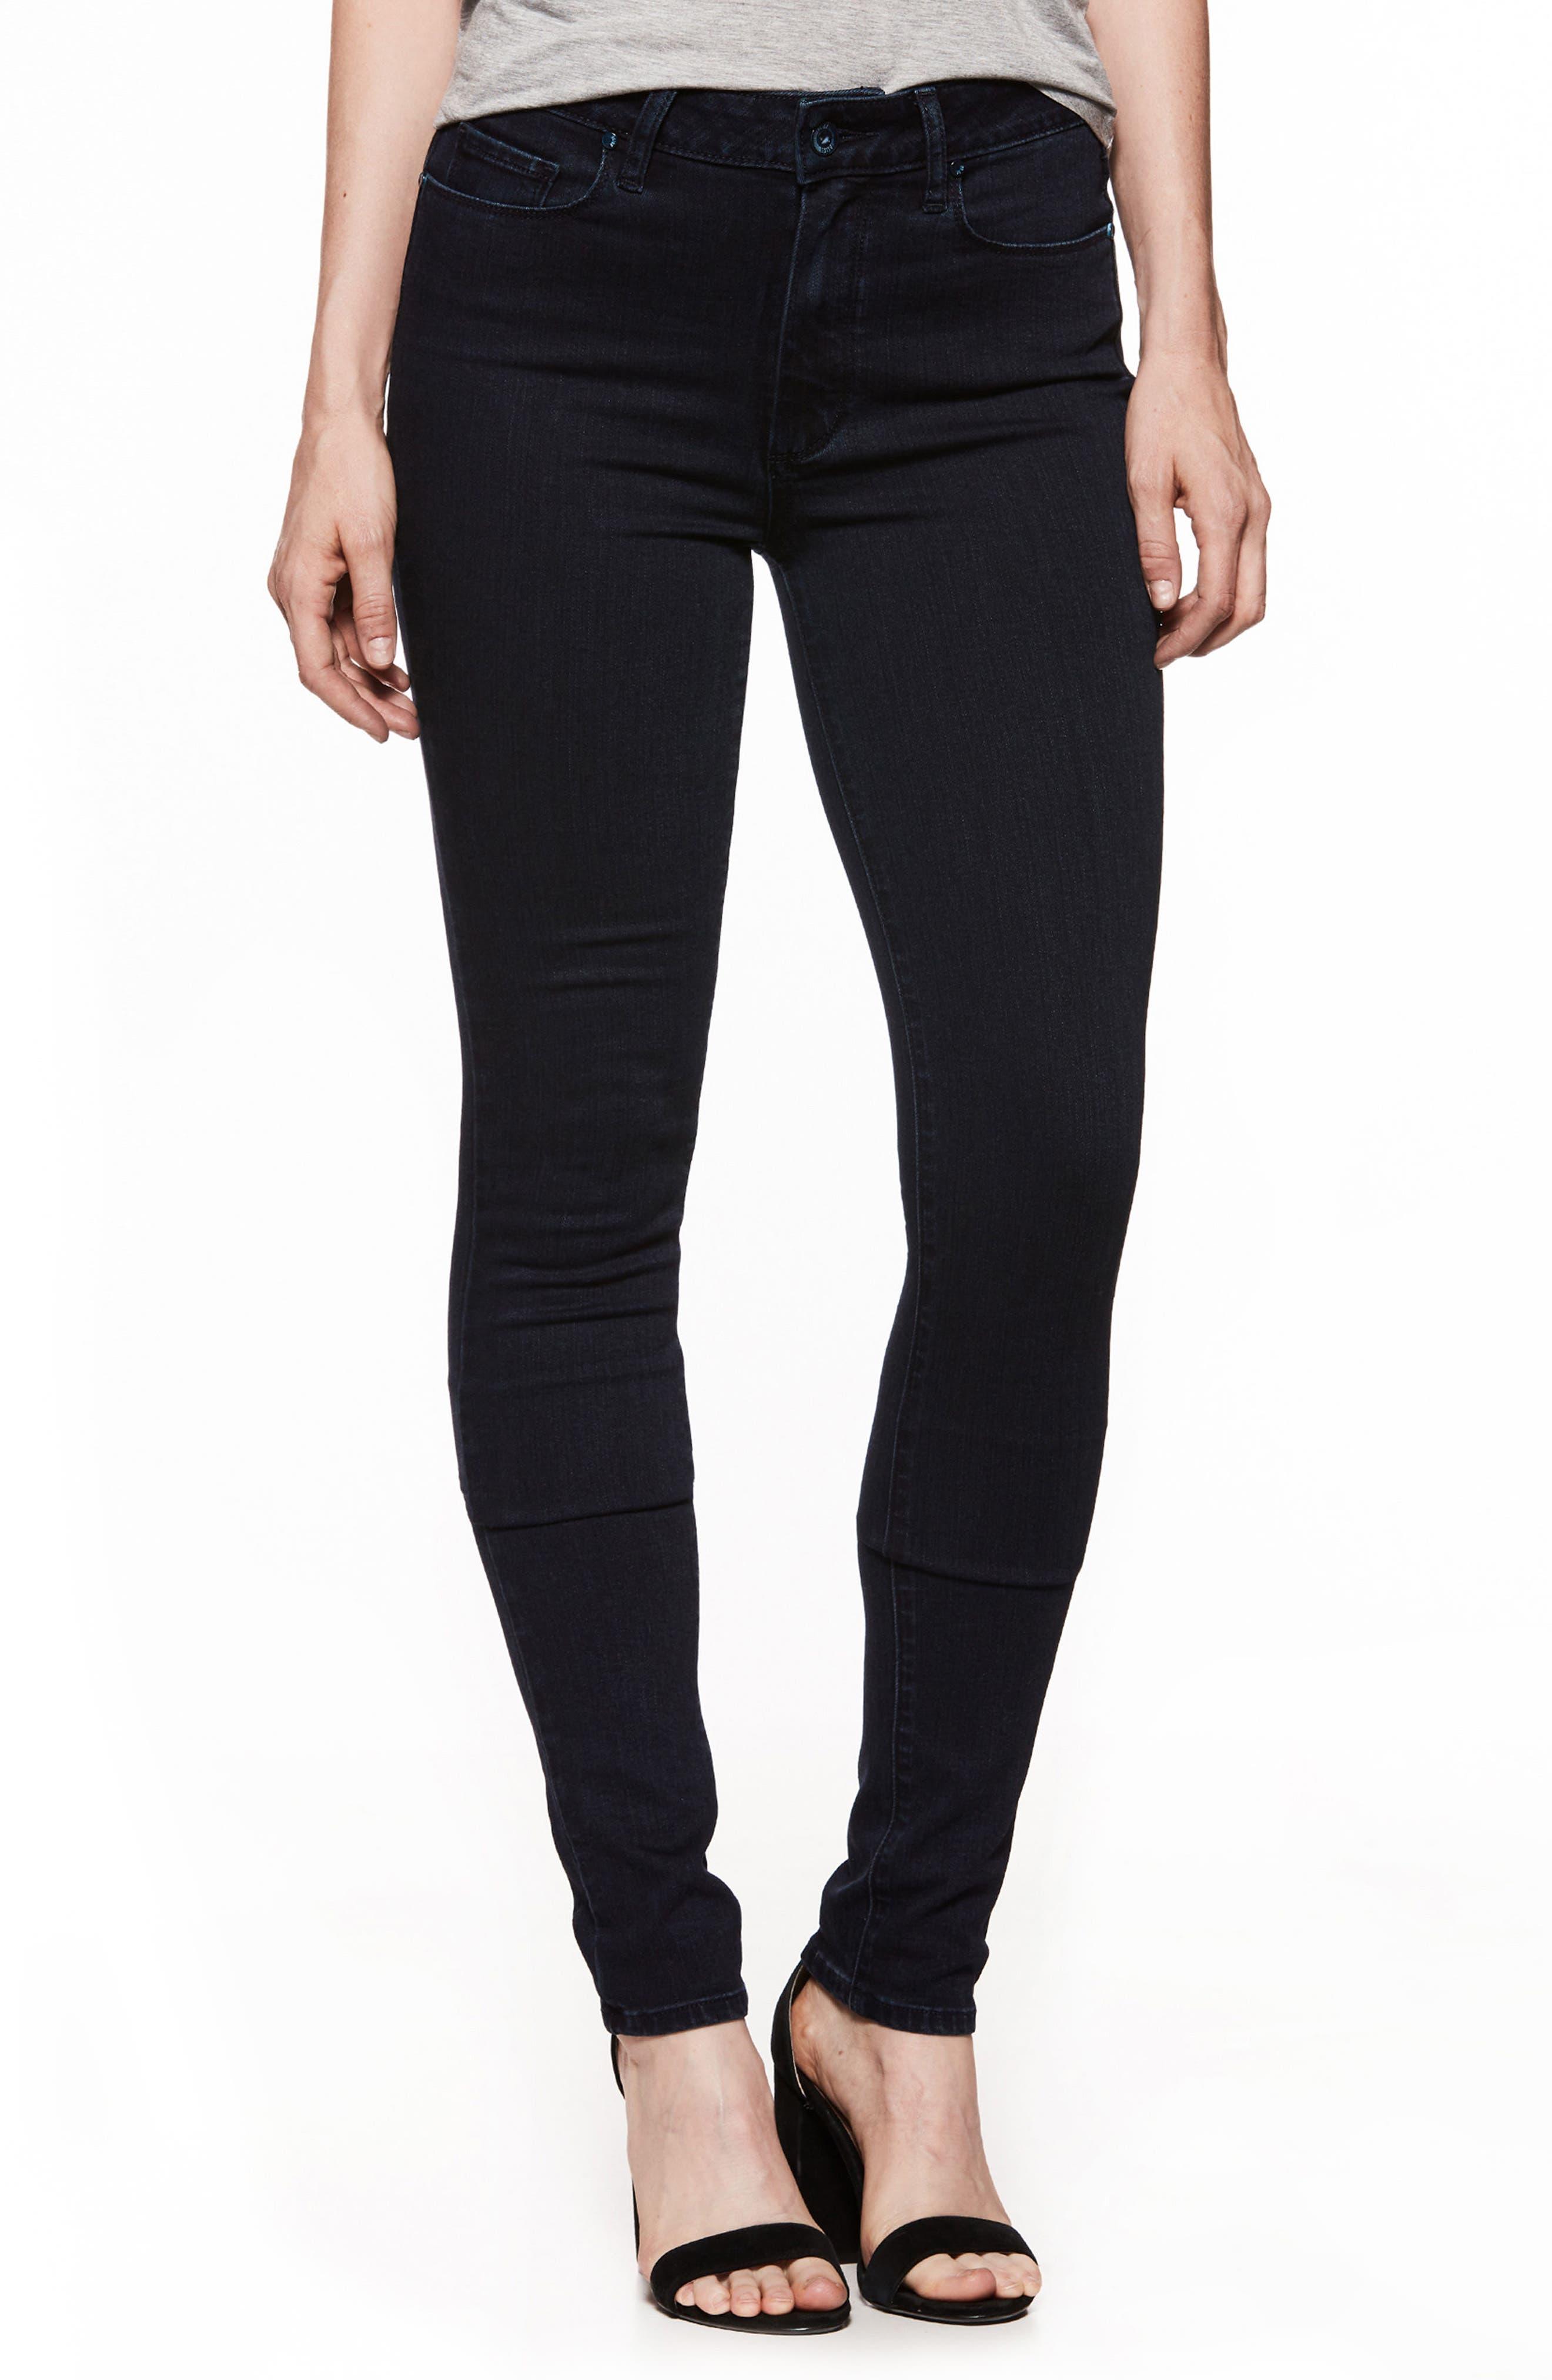 Transcend - Leggy High Waist Ultra Skinny Jeans,                             Main thumbnail 1, color,                             ALLEY